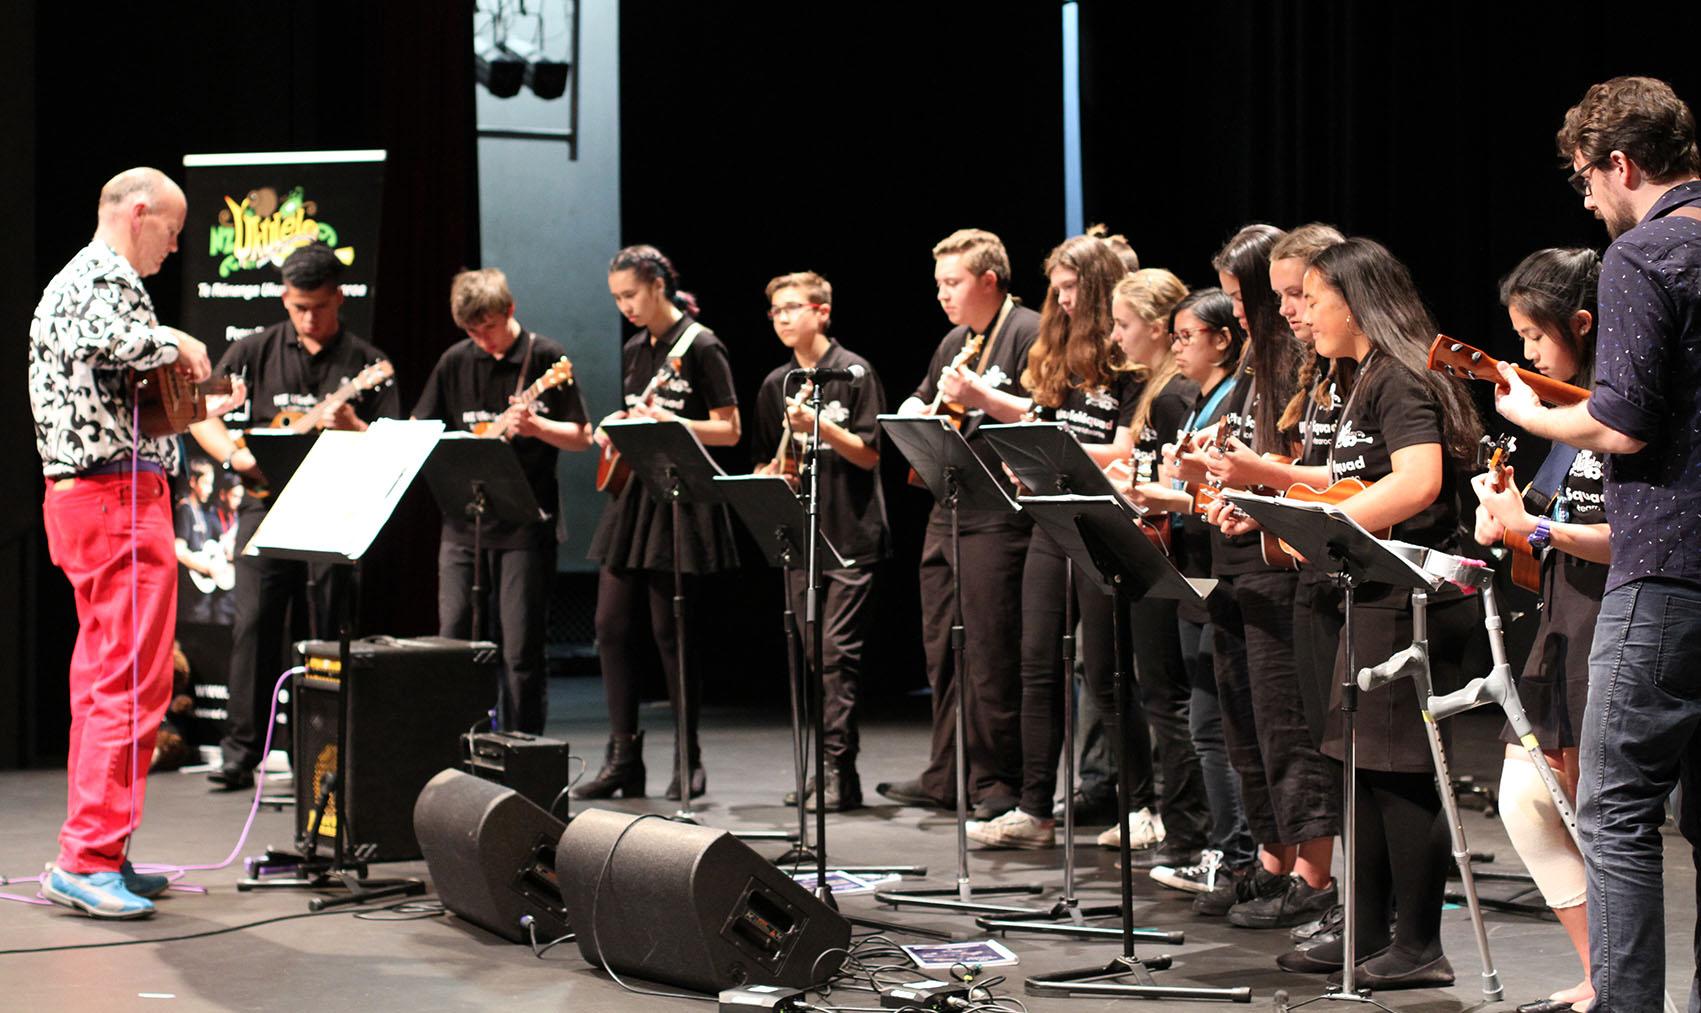 NZ_Ukulele_Squads_James_Hill_rehearsal_20171124_0358.JPG